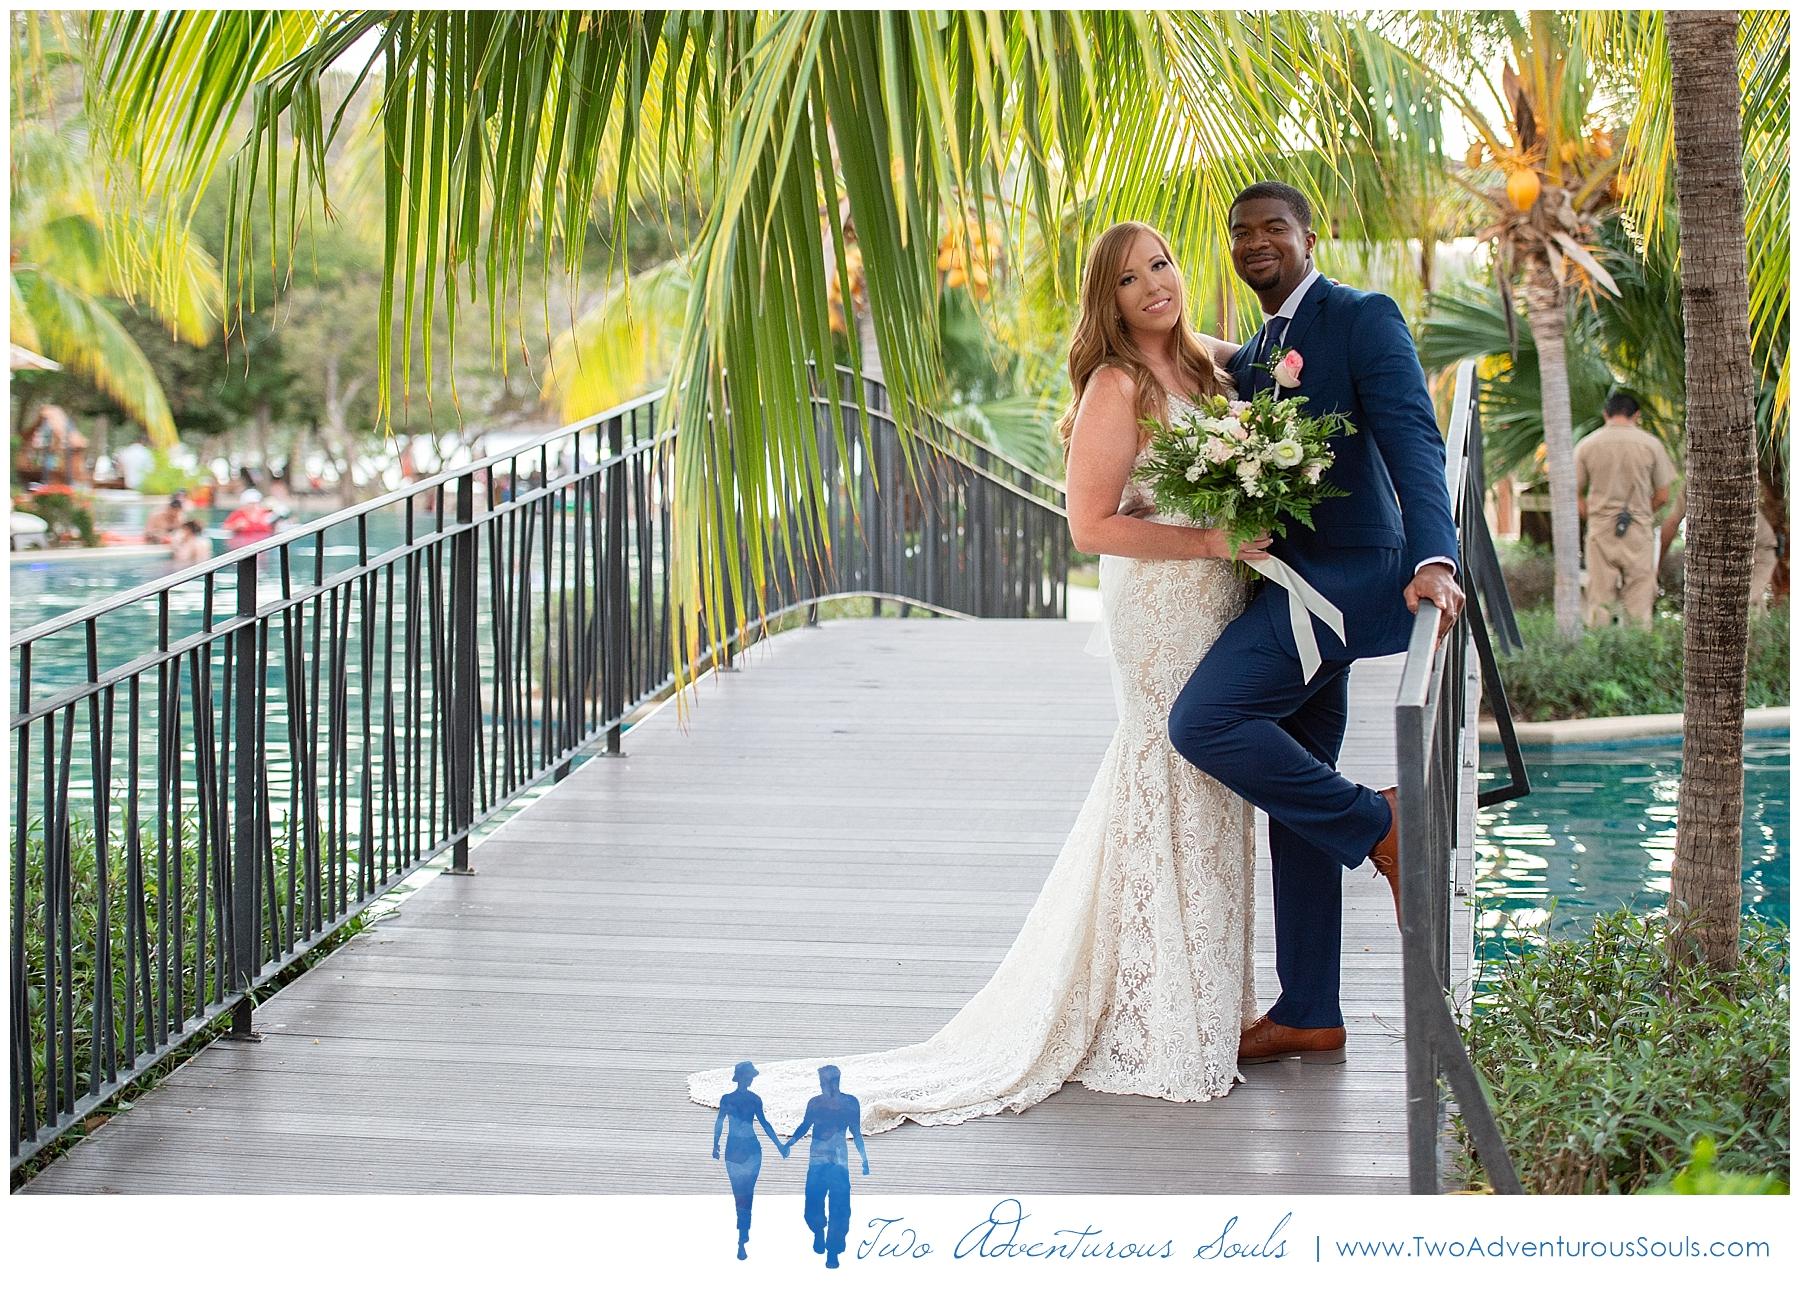 Costa Rica Wedding Photographers, Dreams las Mareas Wedding, Destination Wedding Photographers, Two Adventurous Souls - 022219_0037.jpg